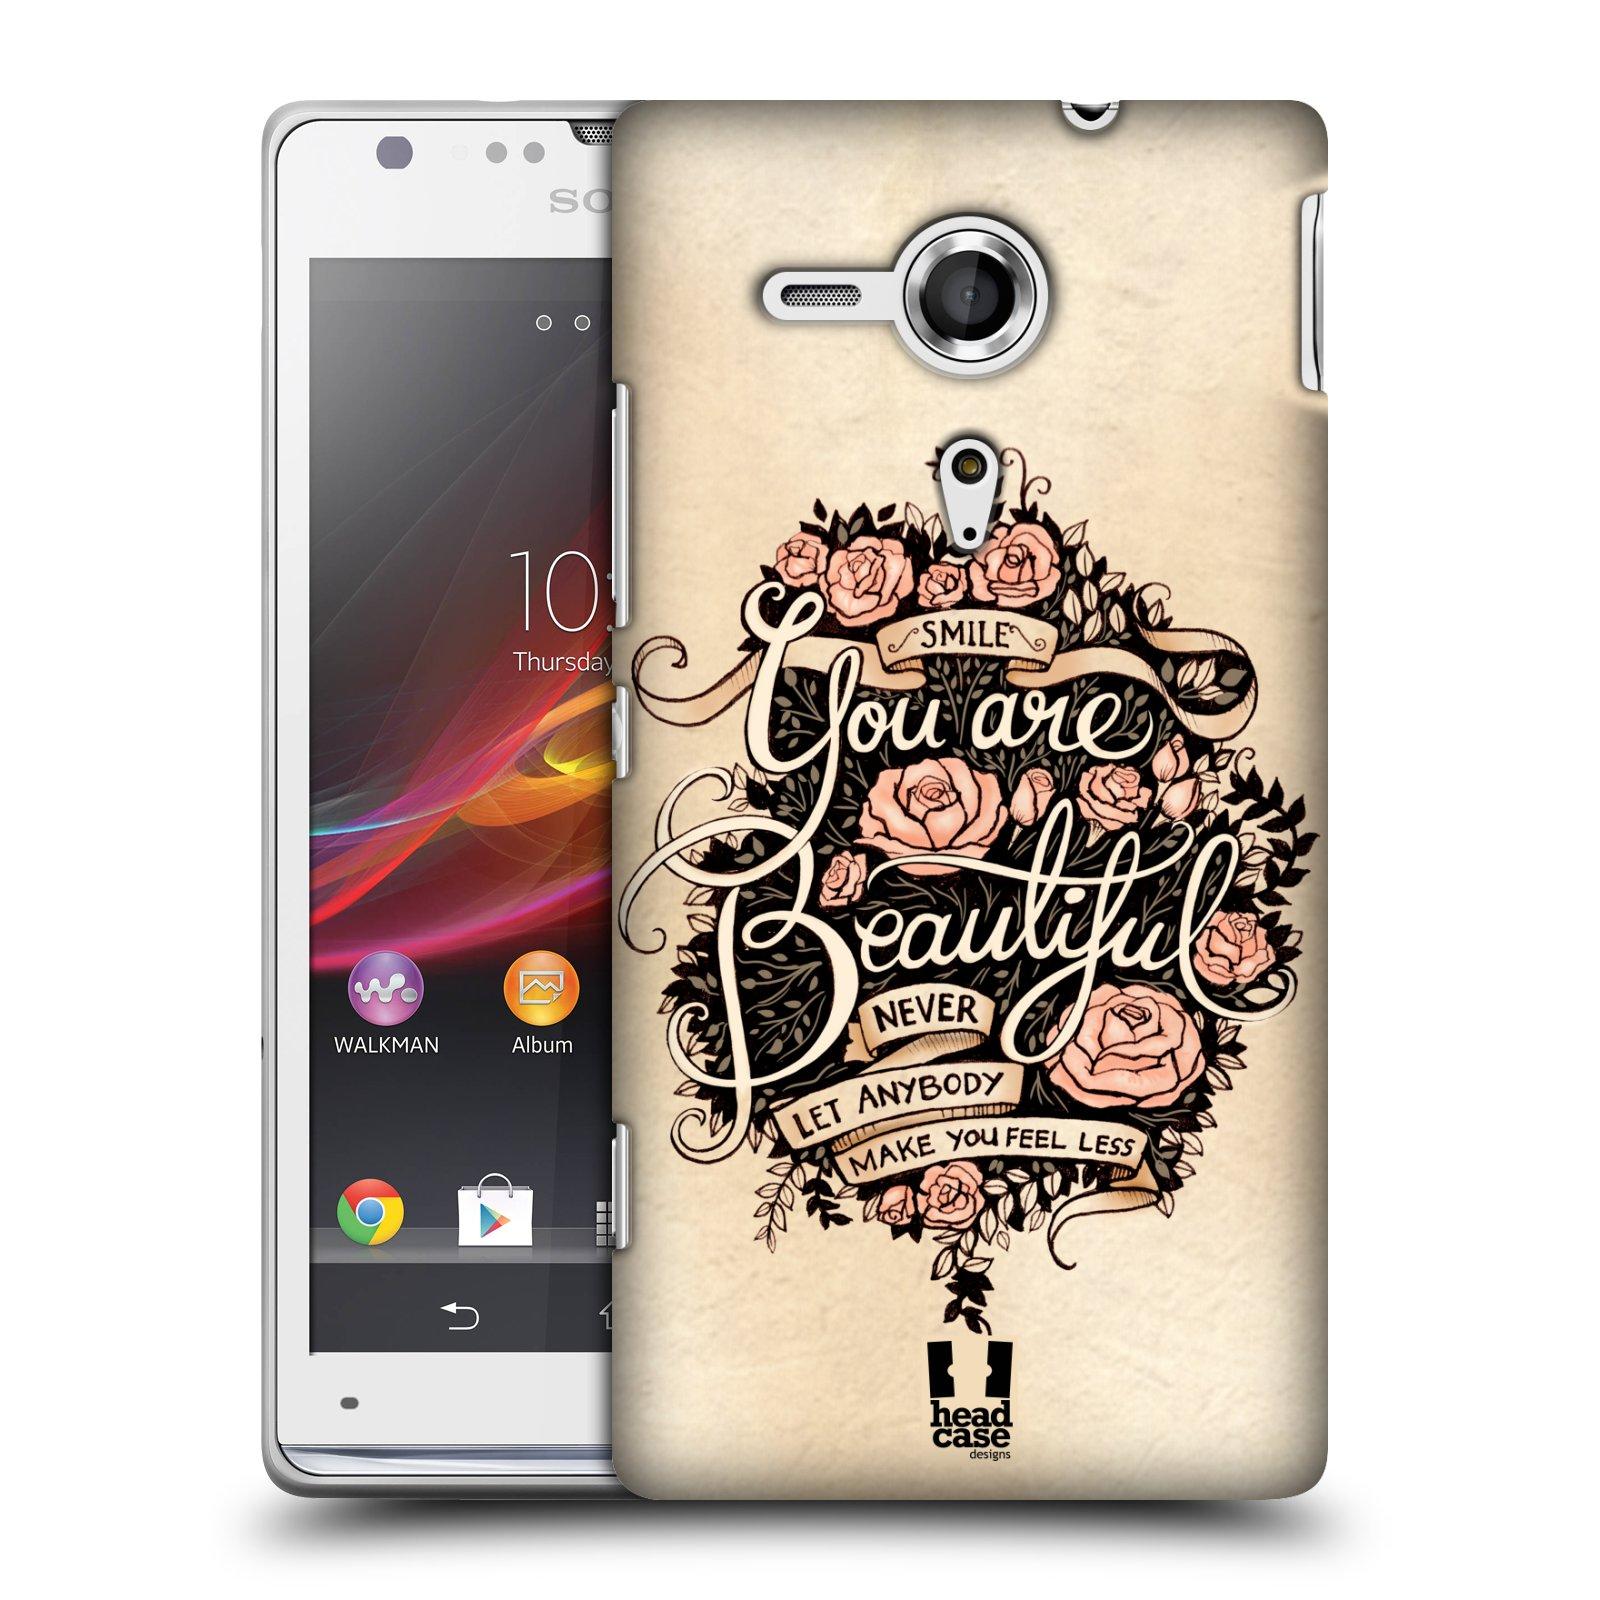 Plastové pouzdro na mobil Sony Xperia SP C5303 HEAD CASE BEAUTIFUL (Kryt či obal na mobilní telefon Sony Xperia SP )